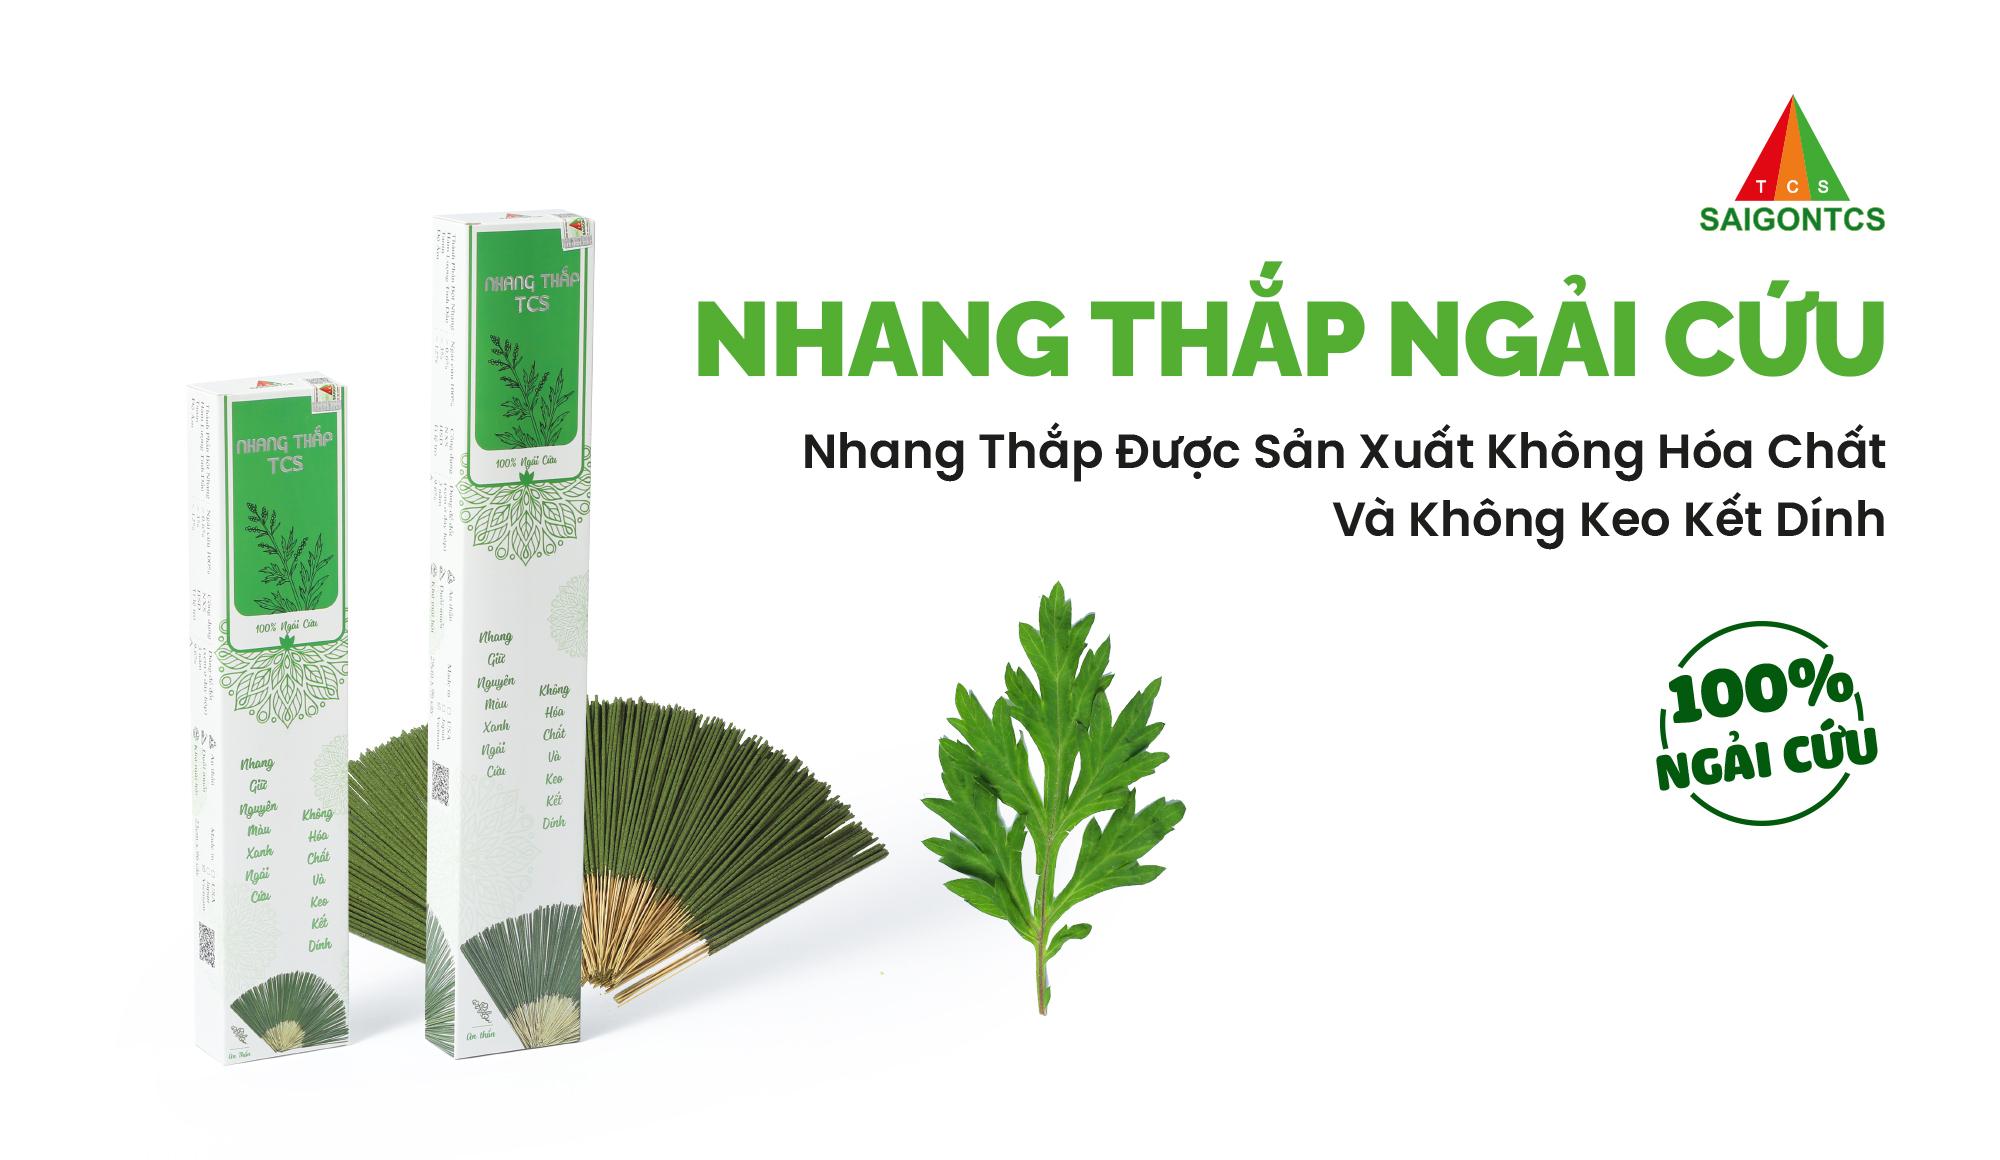 NHANG THẮP TCS